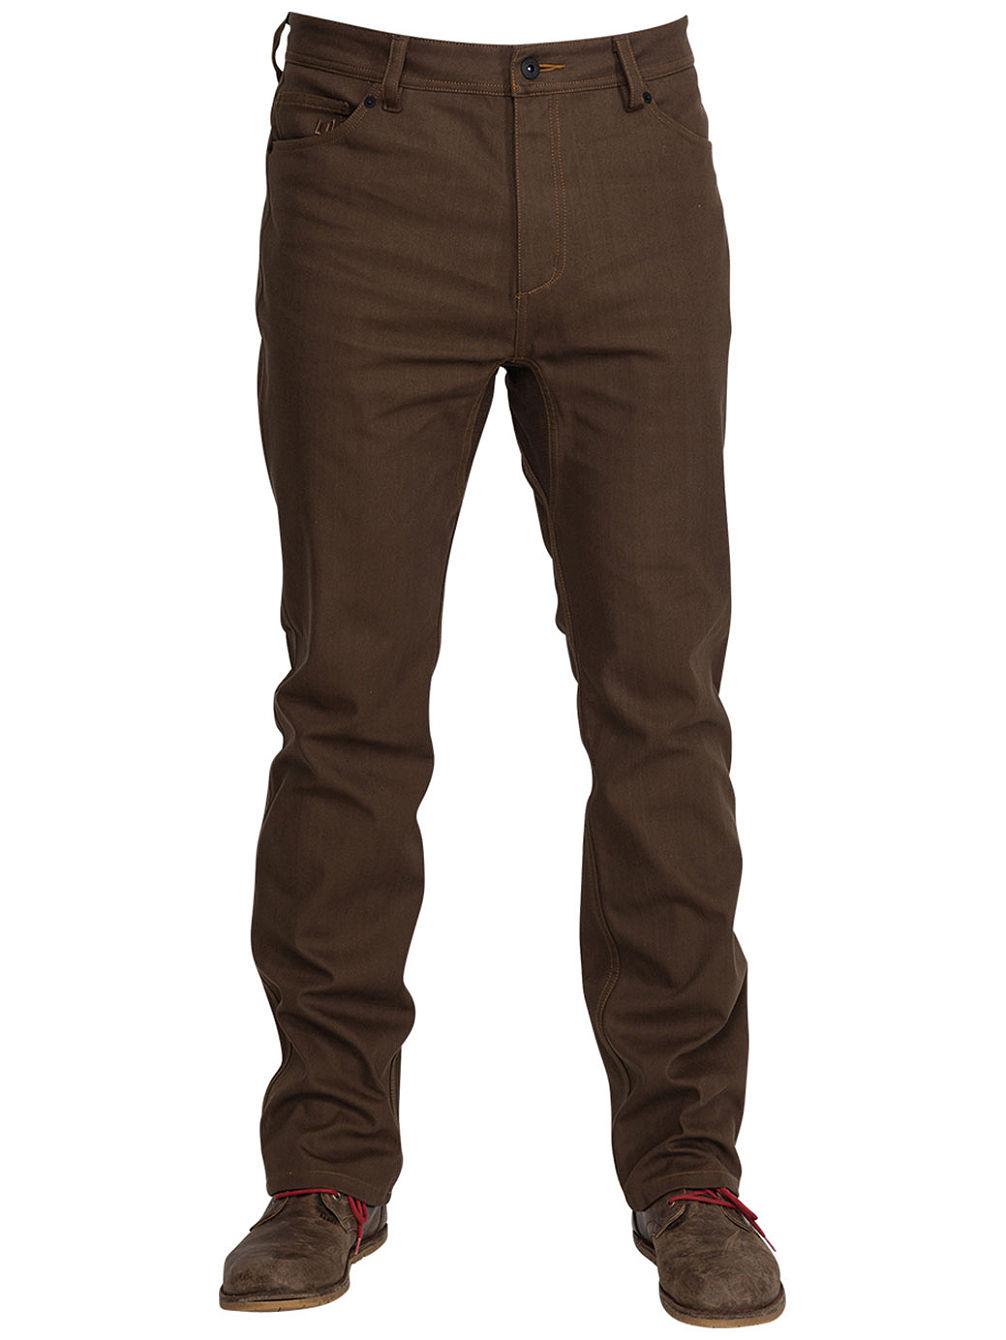 l1-one-pant-pants